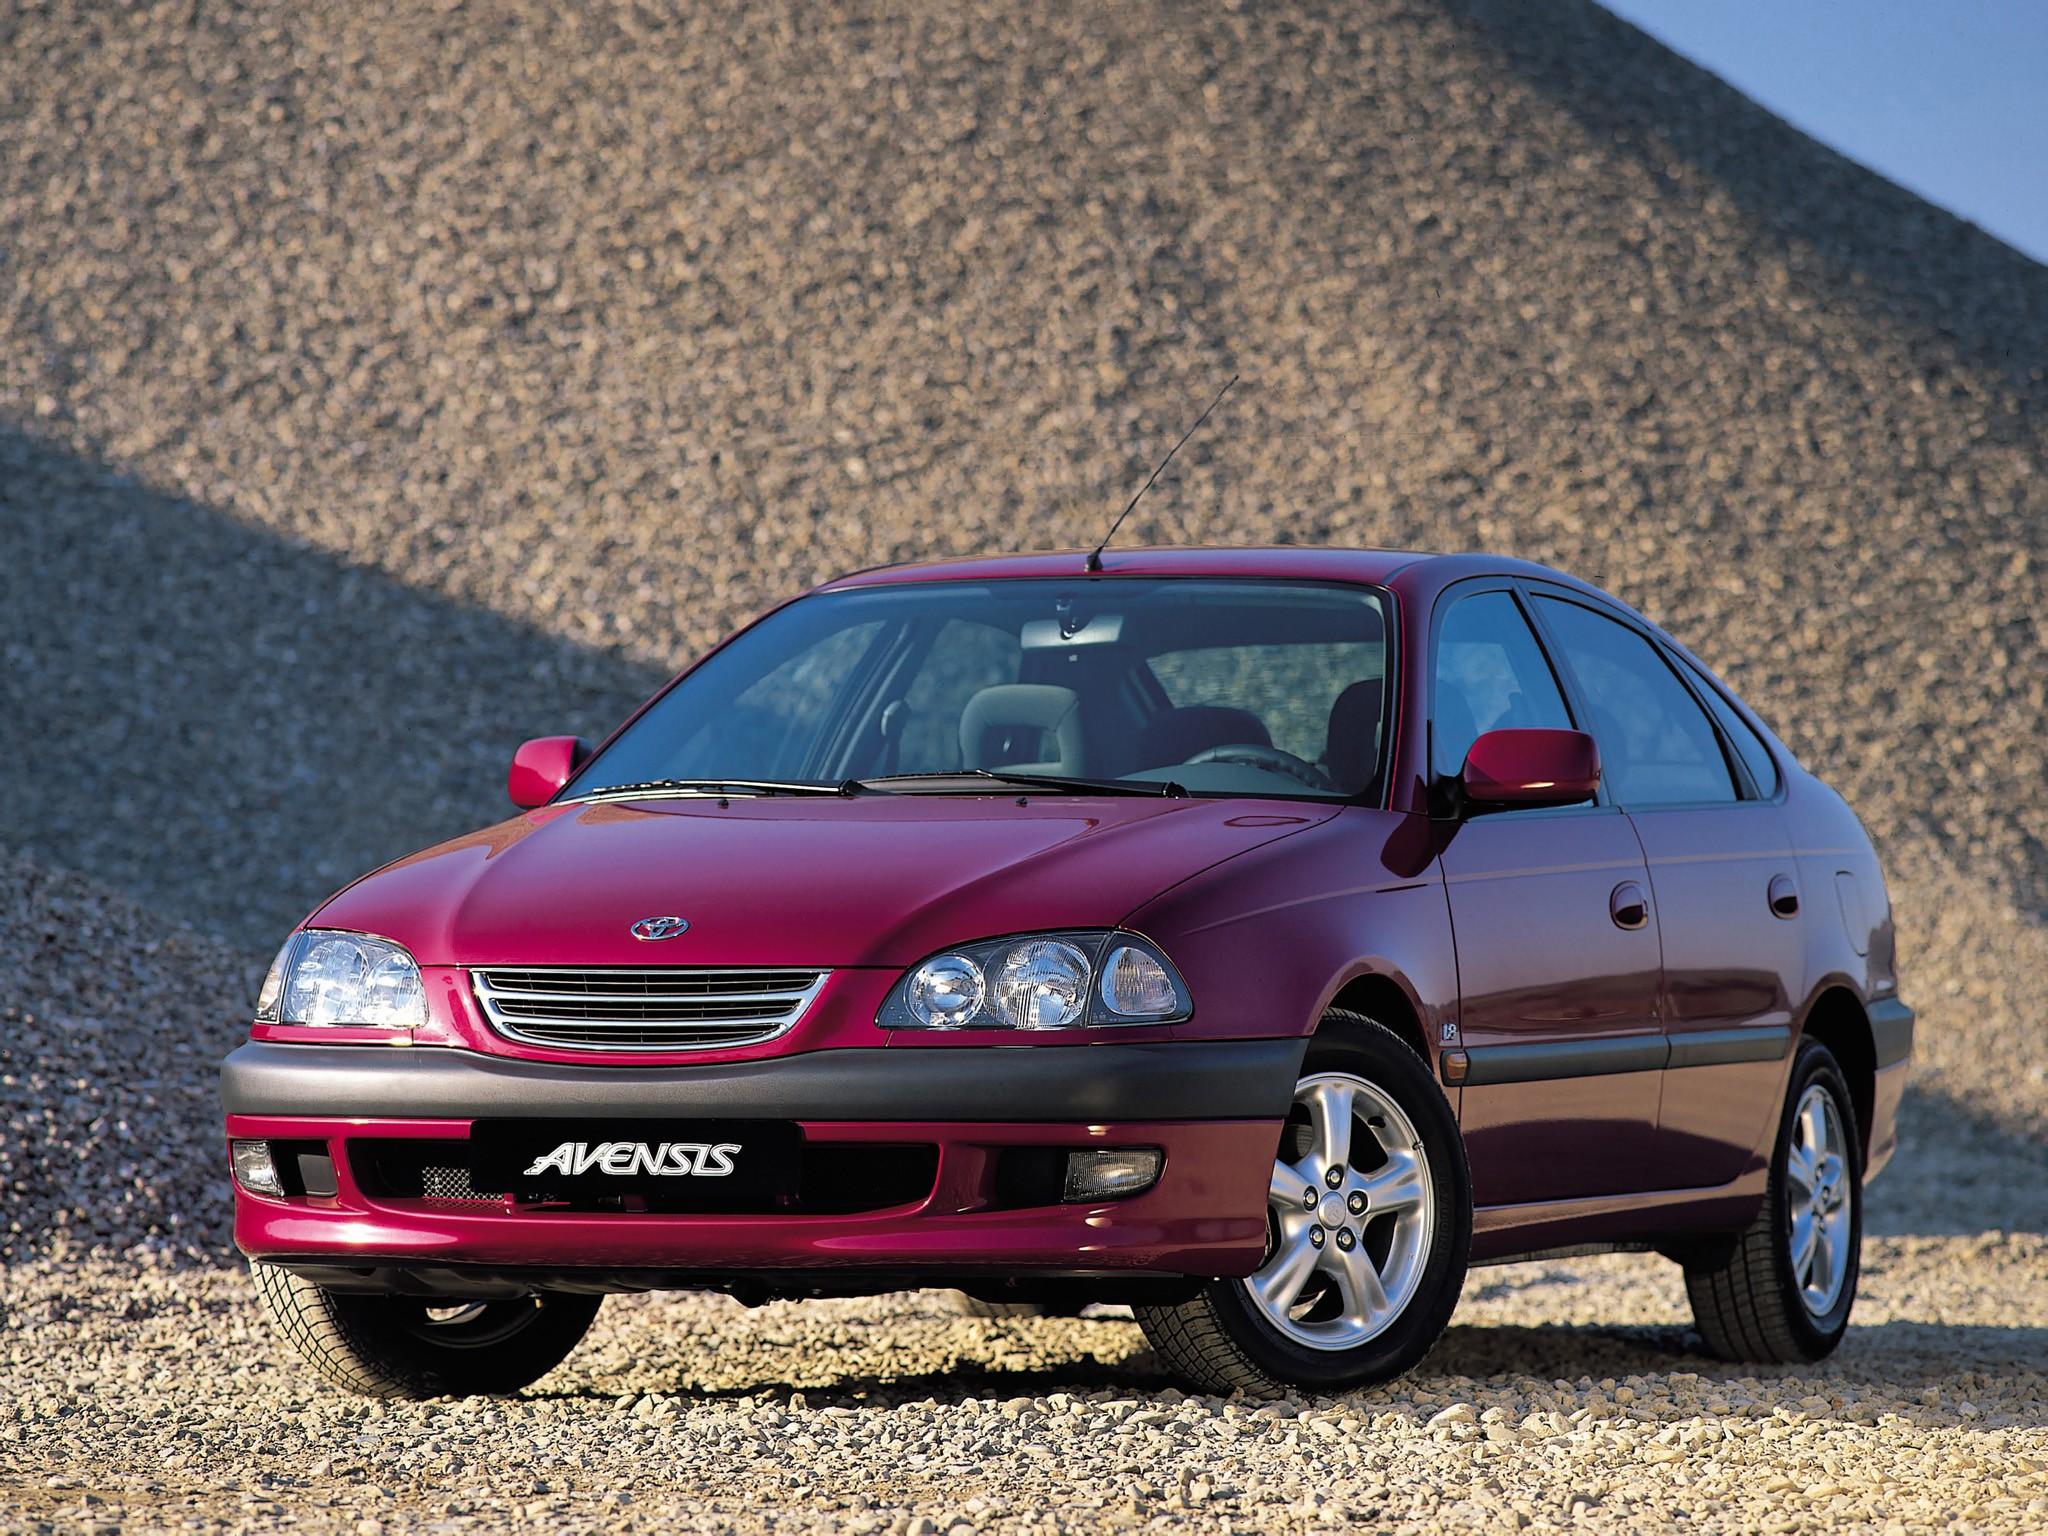 Toyota Avensis I 1997 - 2000 Hatchback 5 door #5